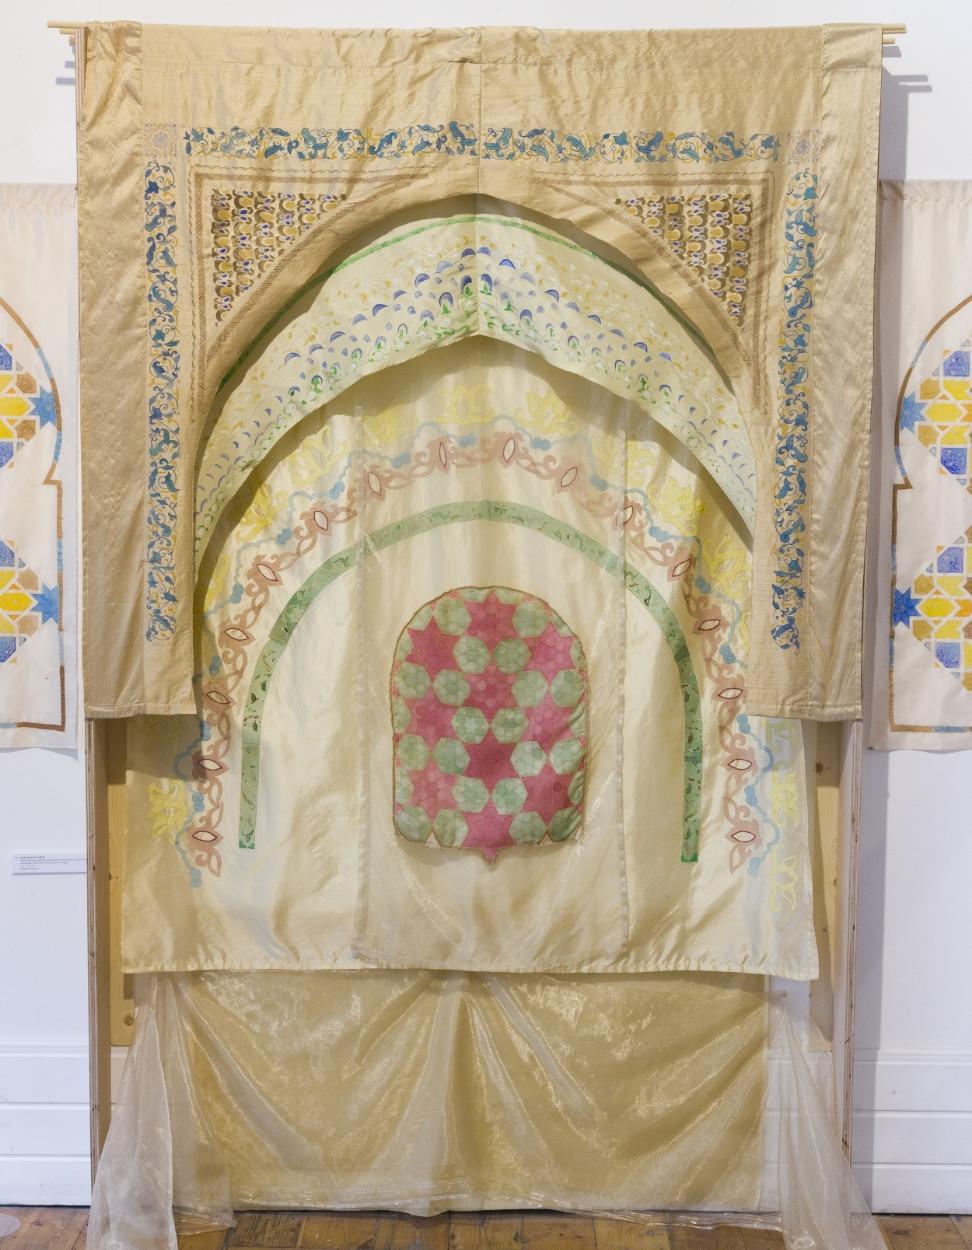 Qarraiwyyin Arch Fabric ~ Islamic Art, Moroccan Art, Textile Art, Pattern Design, Shaheen Kasmani.